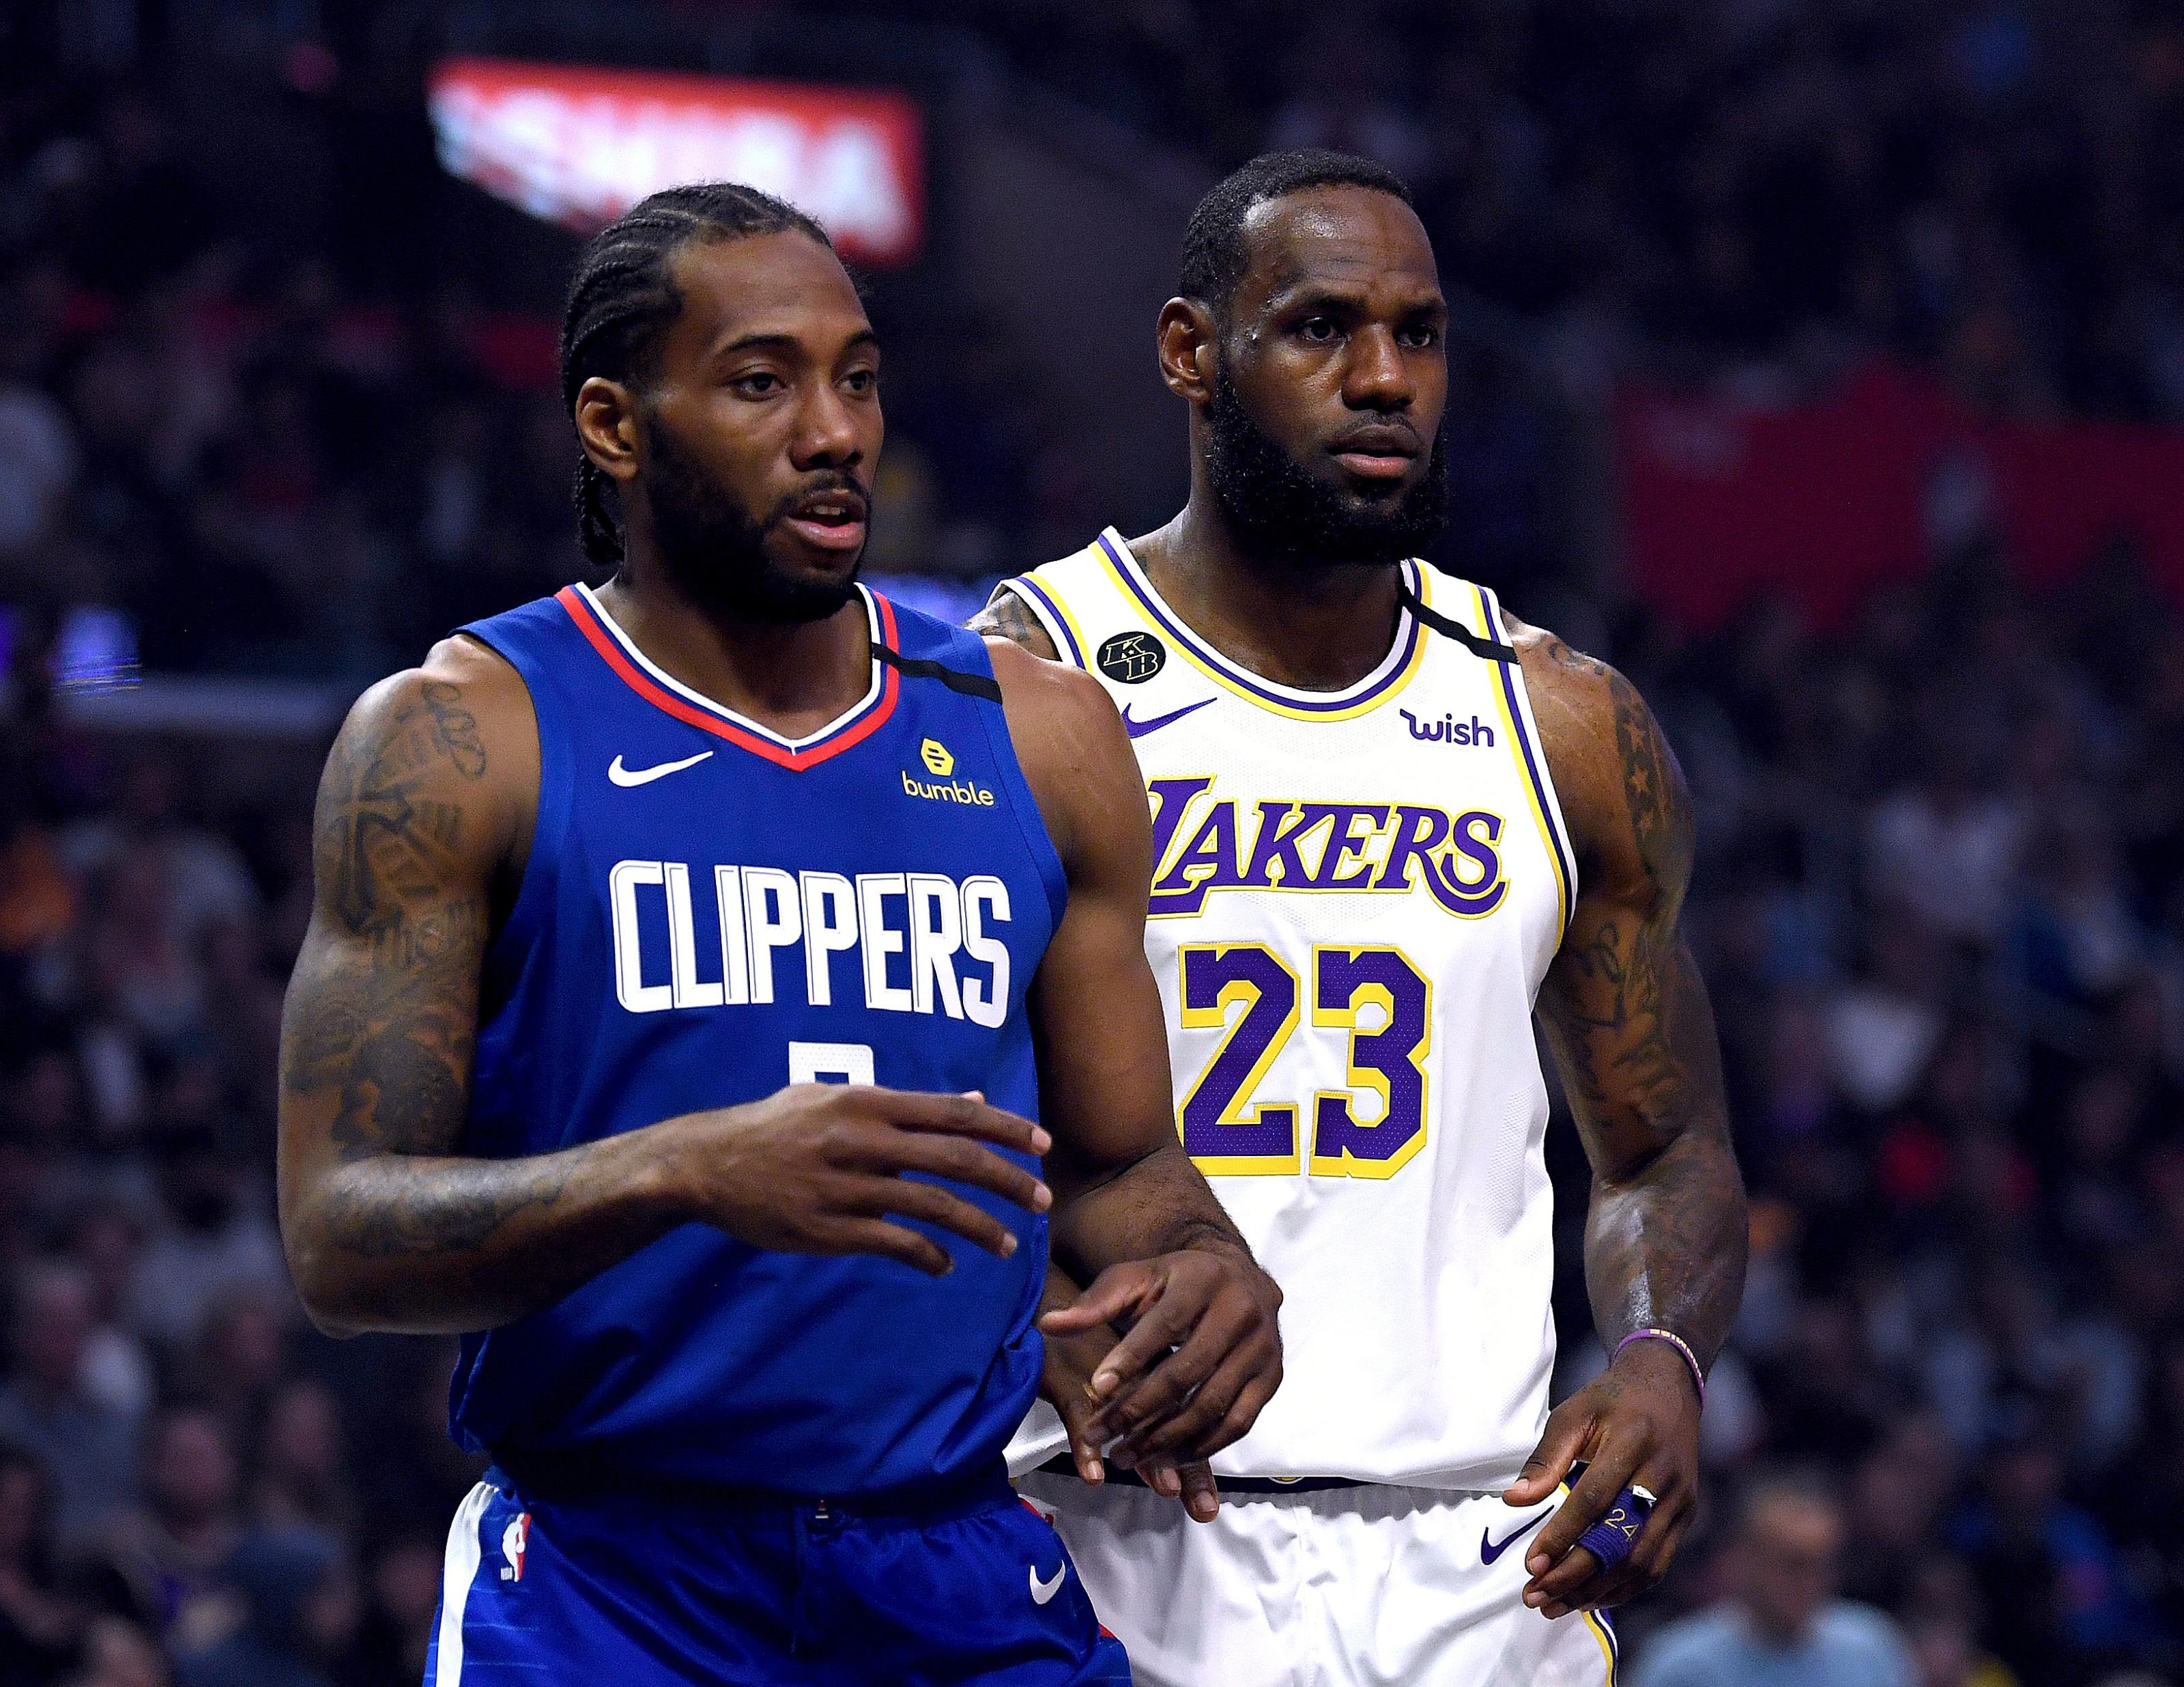 La Clippers Is The Kawhi Leonard Lebron James Rivalry The Nba S Best